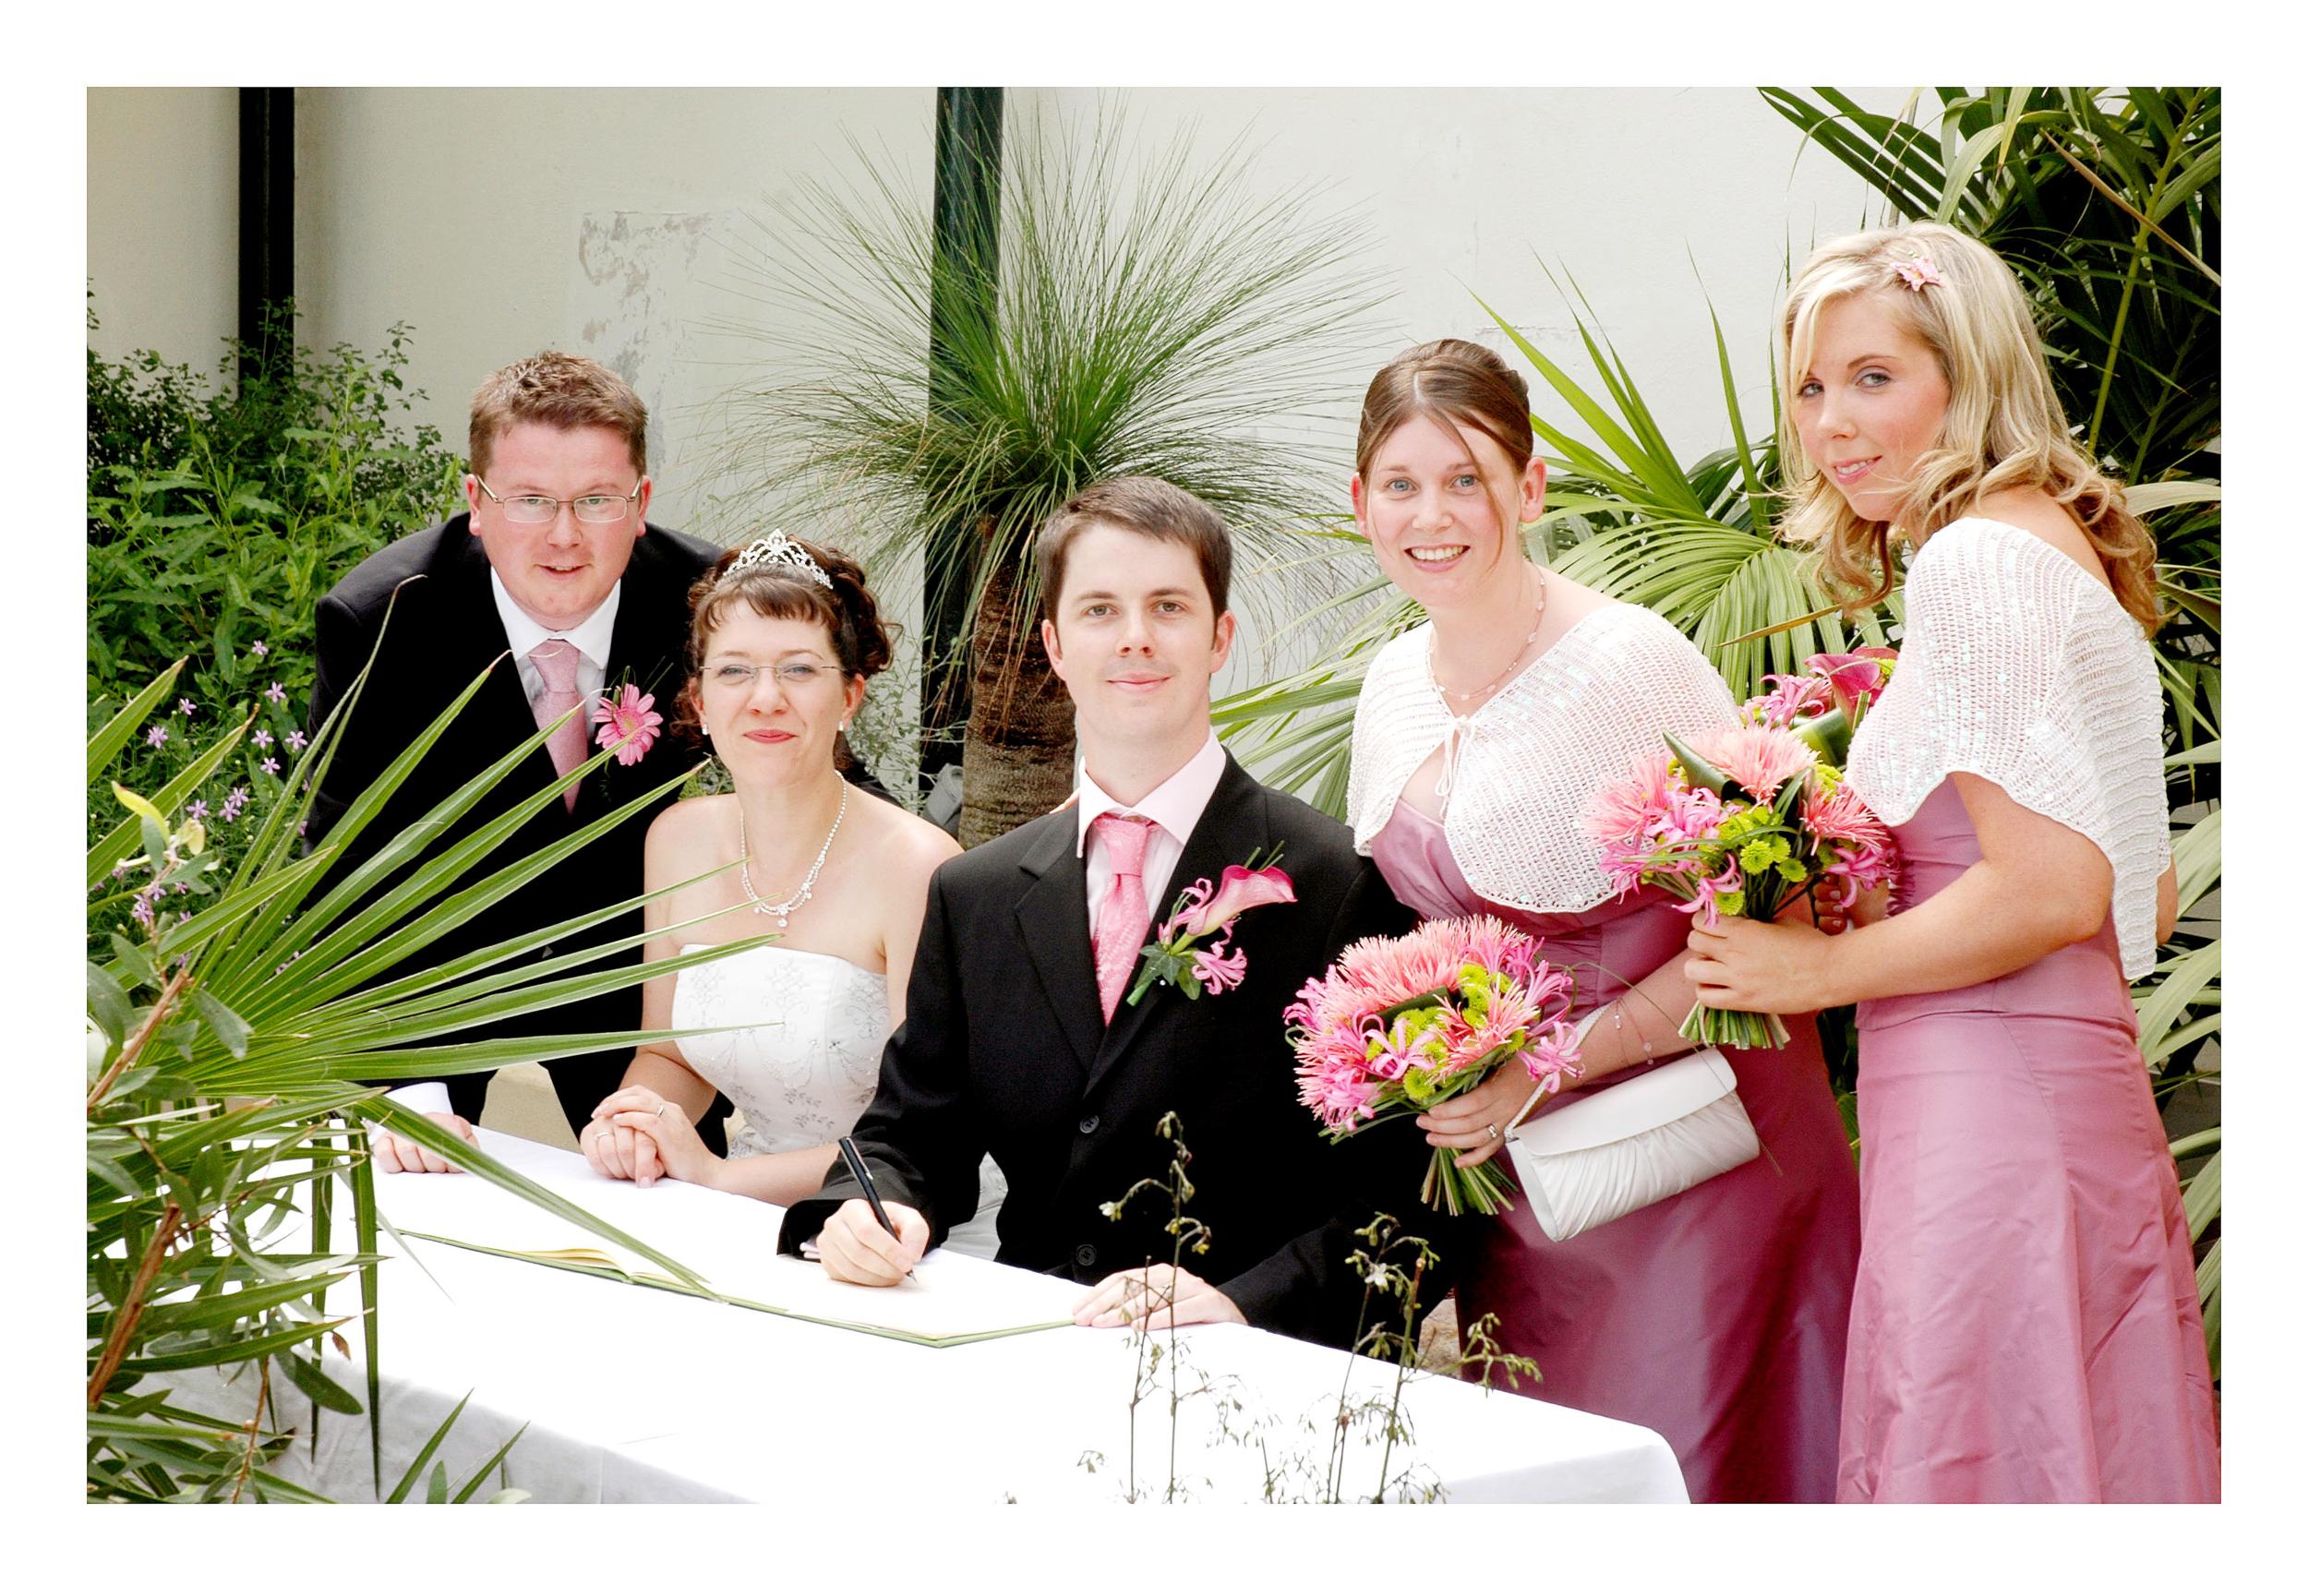 REPORTAGE-WEDDING-PHOTOGRAPHY-SET-UK-19.jpg